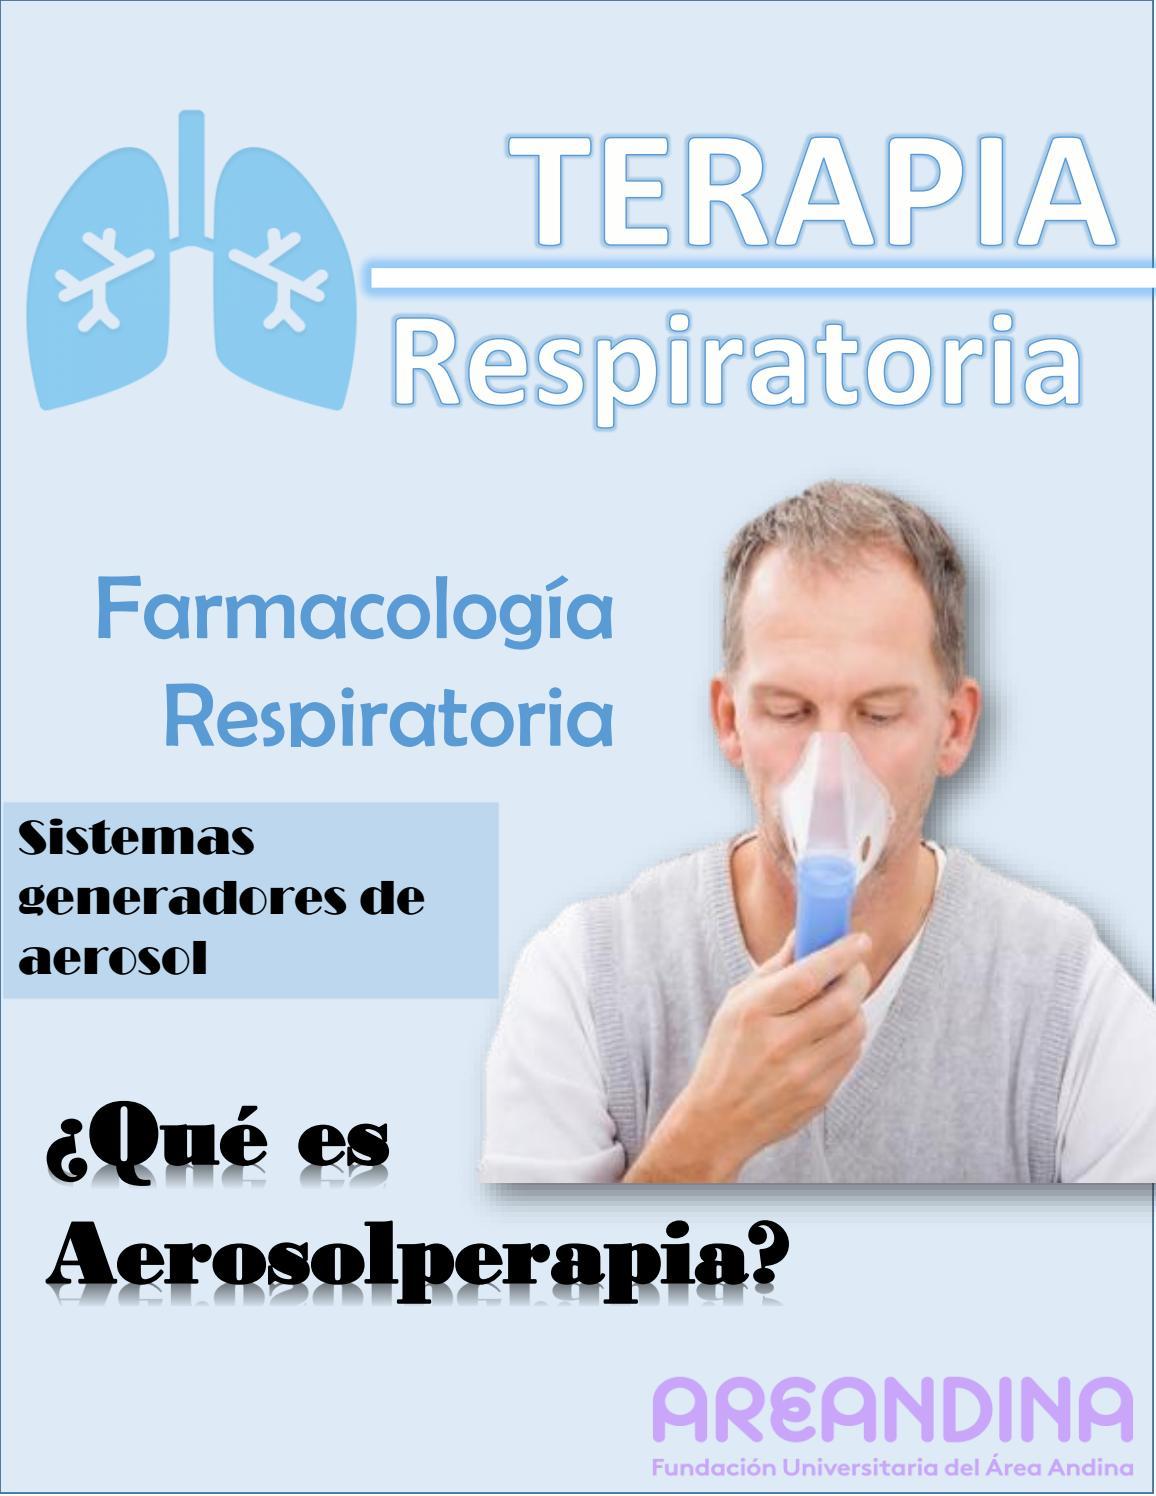 TERAPIA RESPIRATORIA - AEROSOLTERAPIA by daniela camacho ...